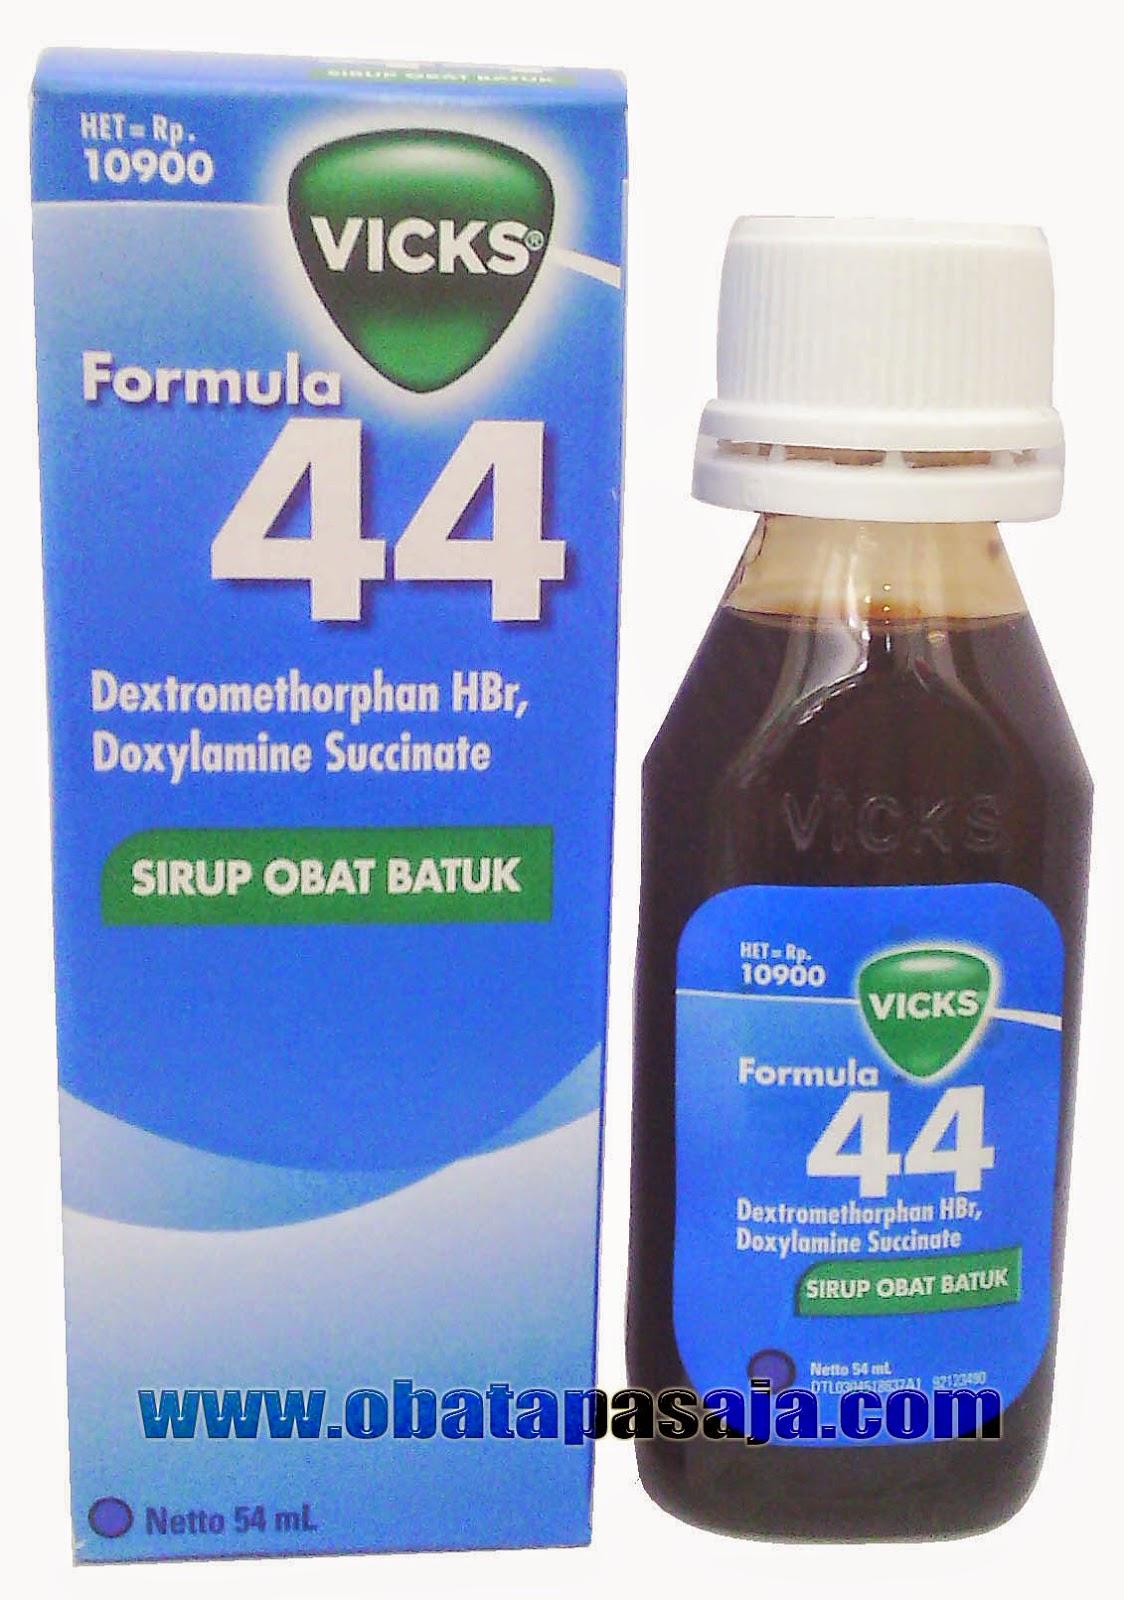 Dosis dan Komposisi Vicks Formula 44